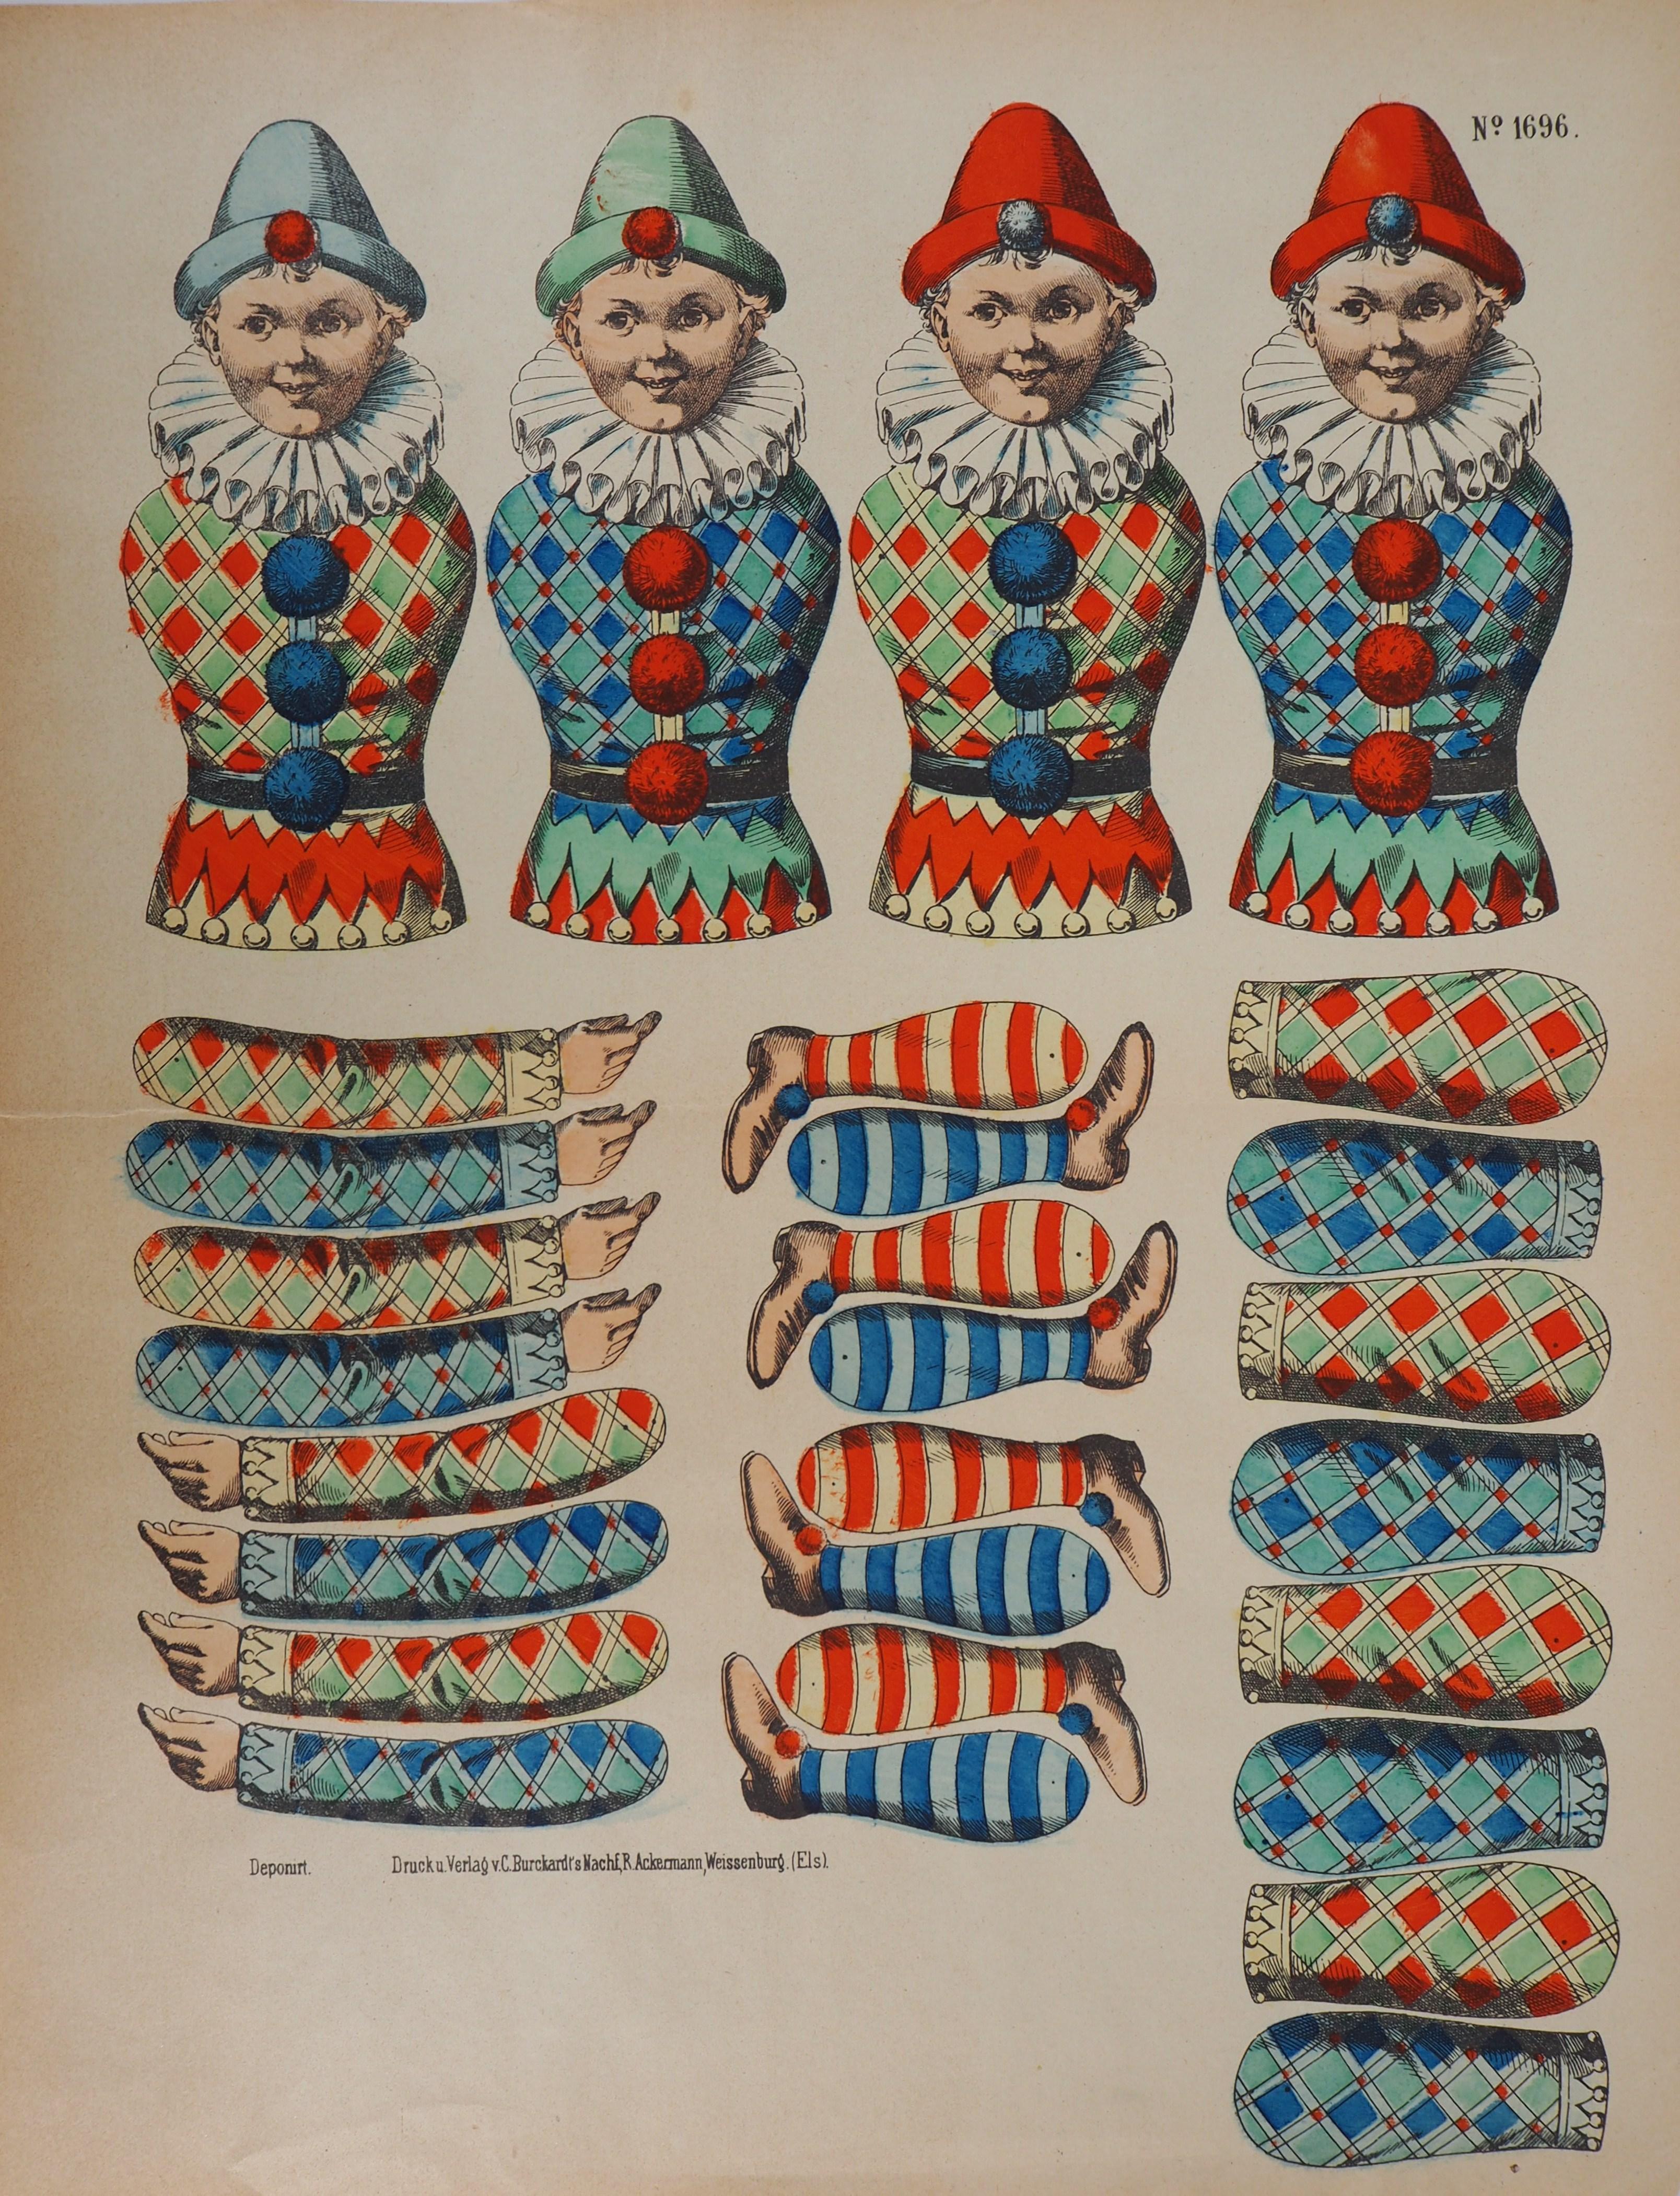 Imagerie de Wissembourg - Colorful Pierrots - Lithograph and stencil - c. 1906